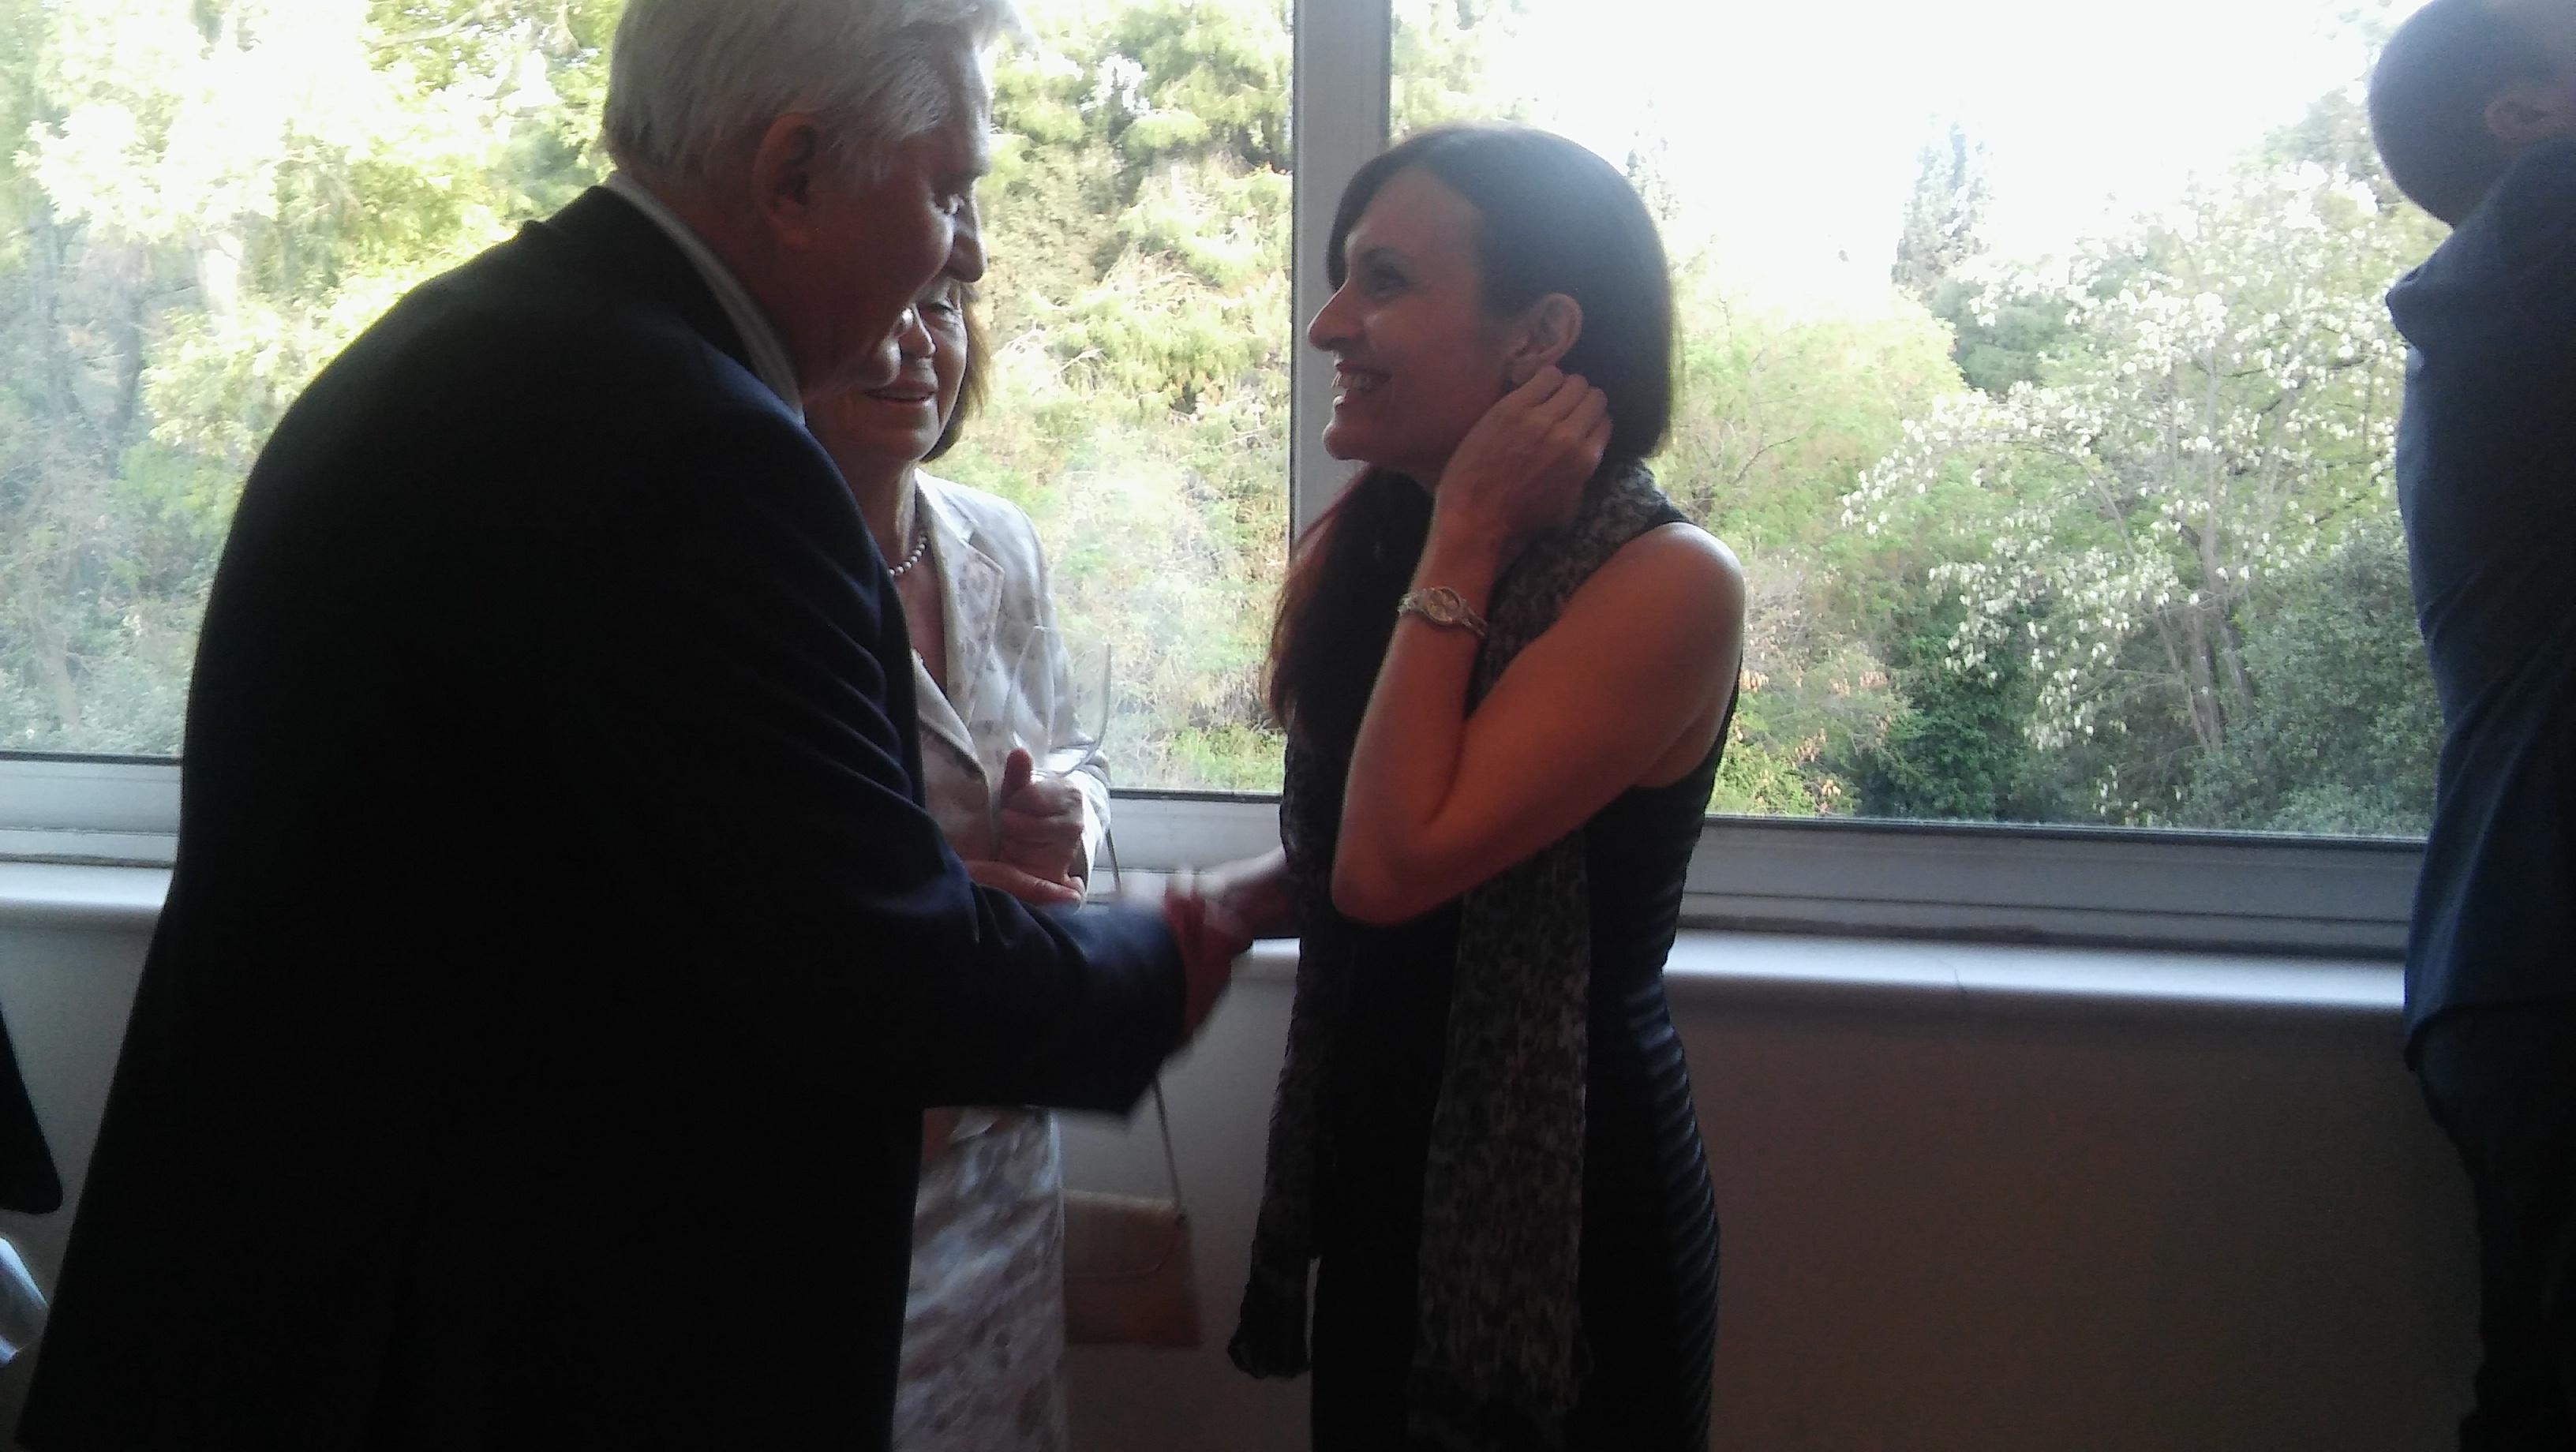 The Ambassador of the Argentine Republic, Carolina Pérez Colman, welcomes the guests